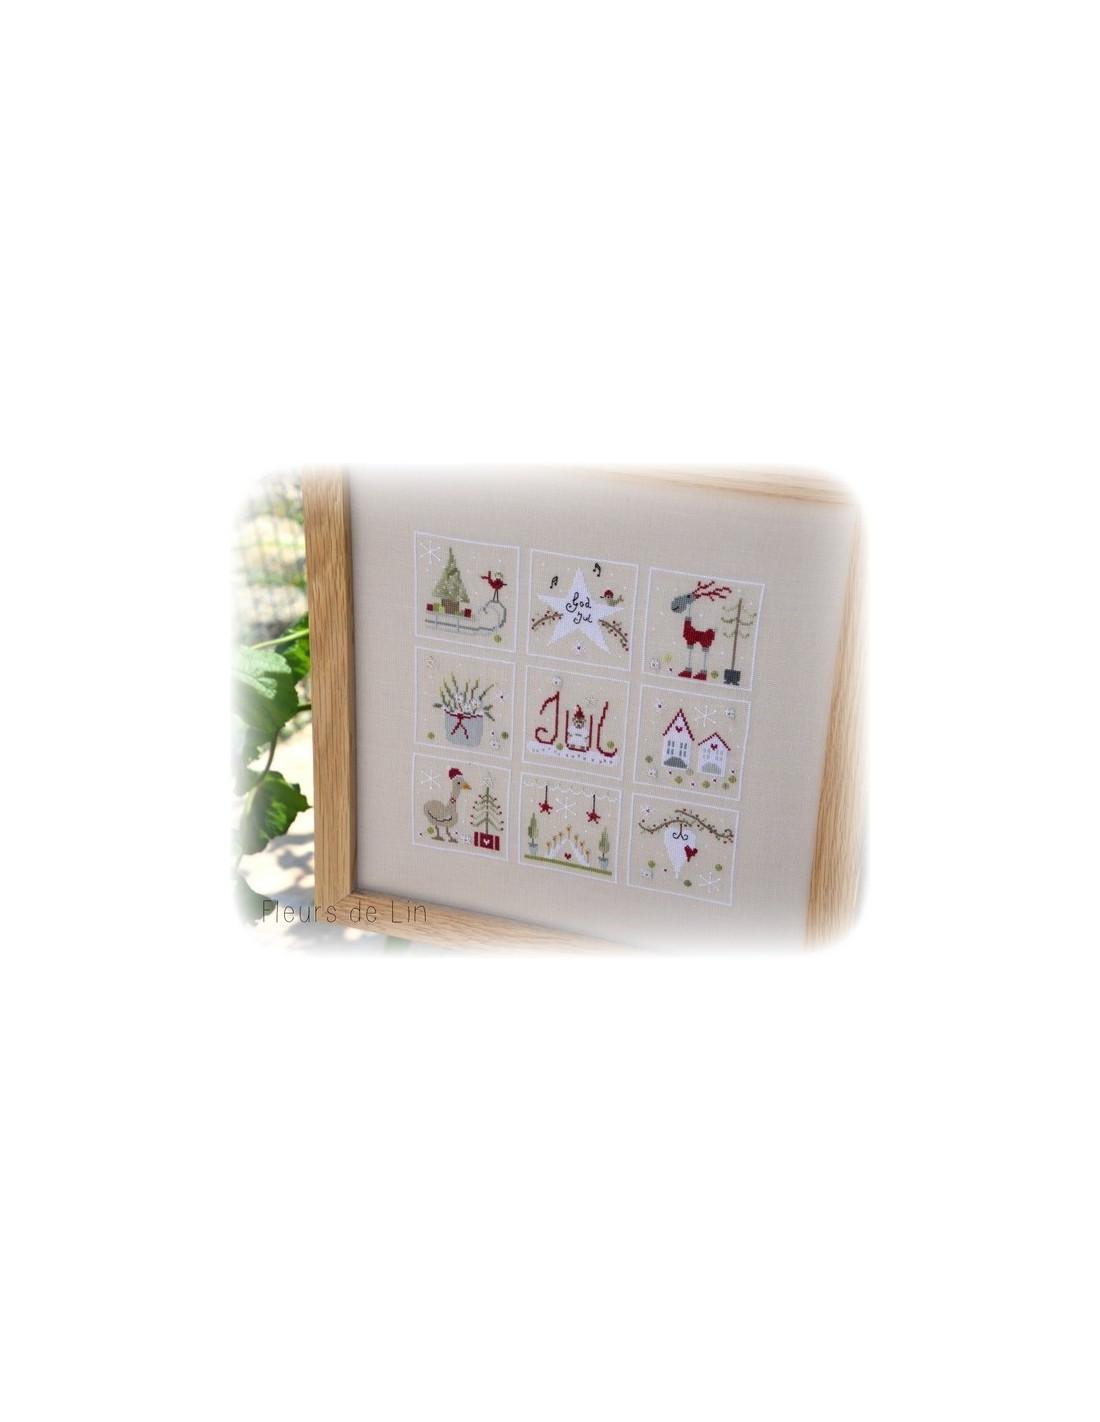 fleurs de lin no l scandinave cross stitch chart. Black Bedroom Furniture Sets. Home Design Ideas